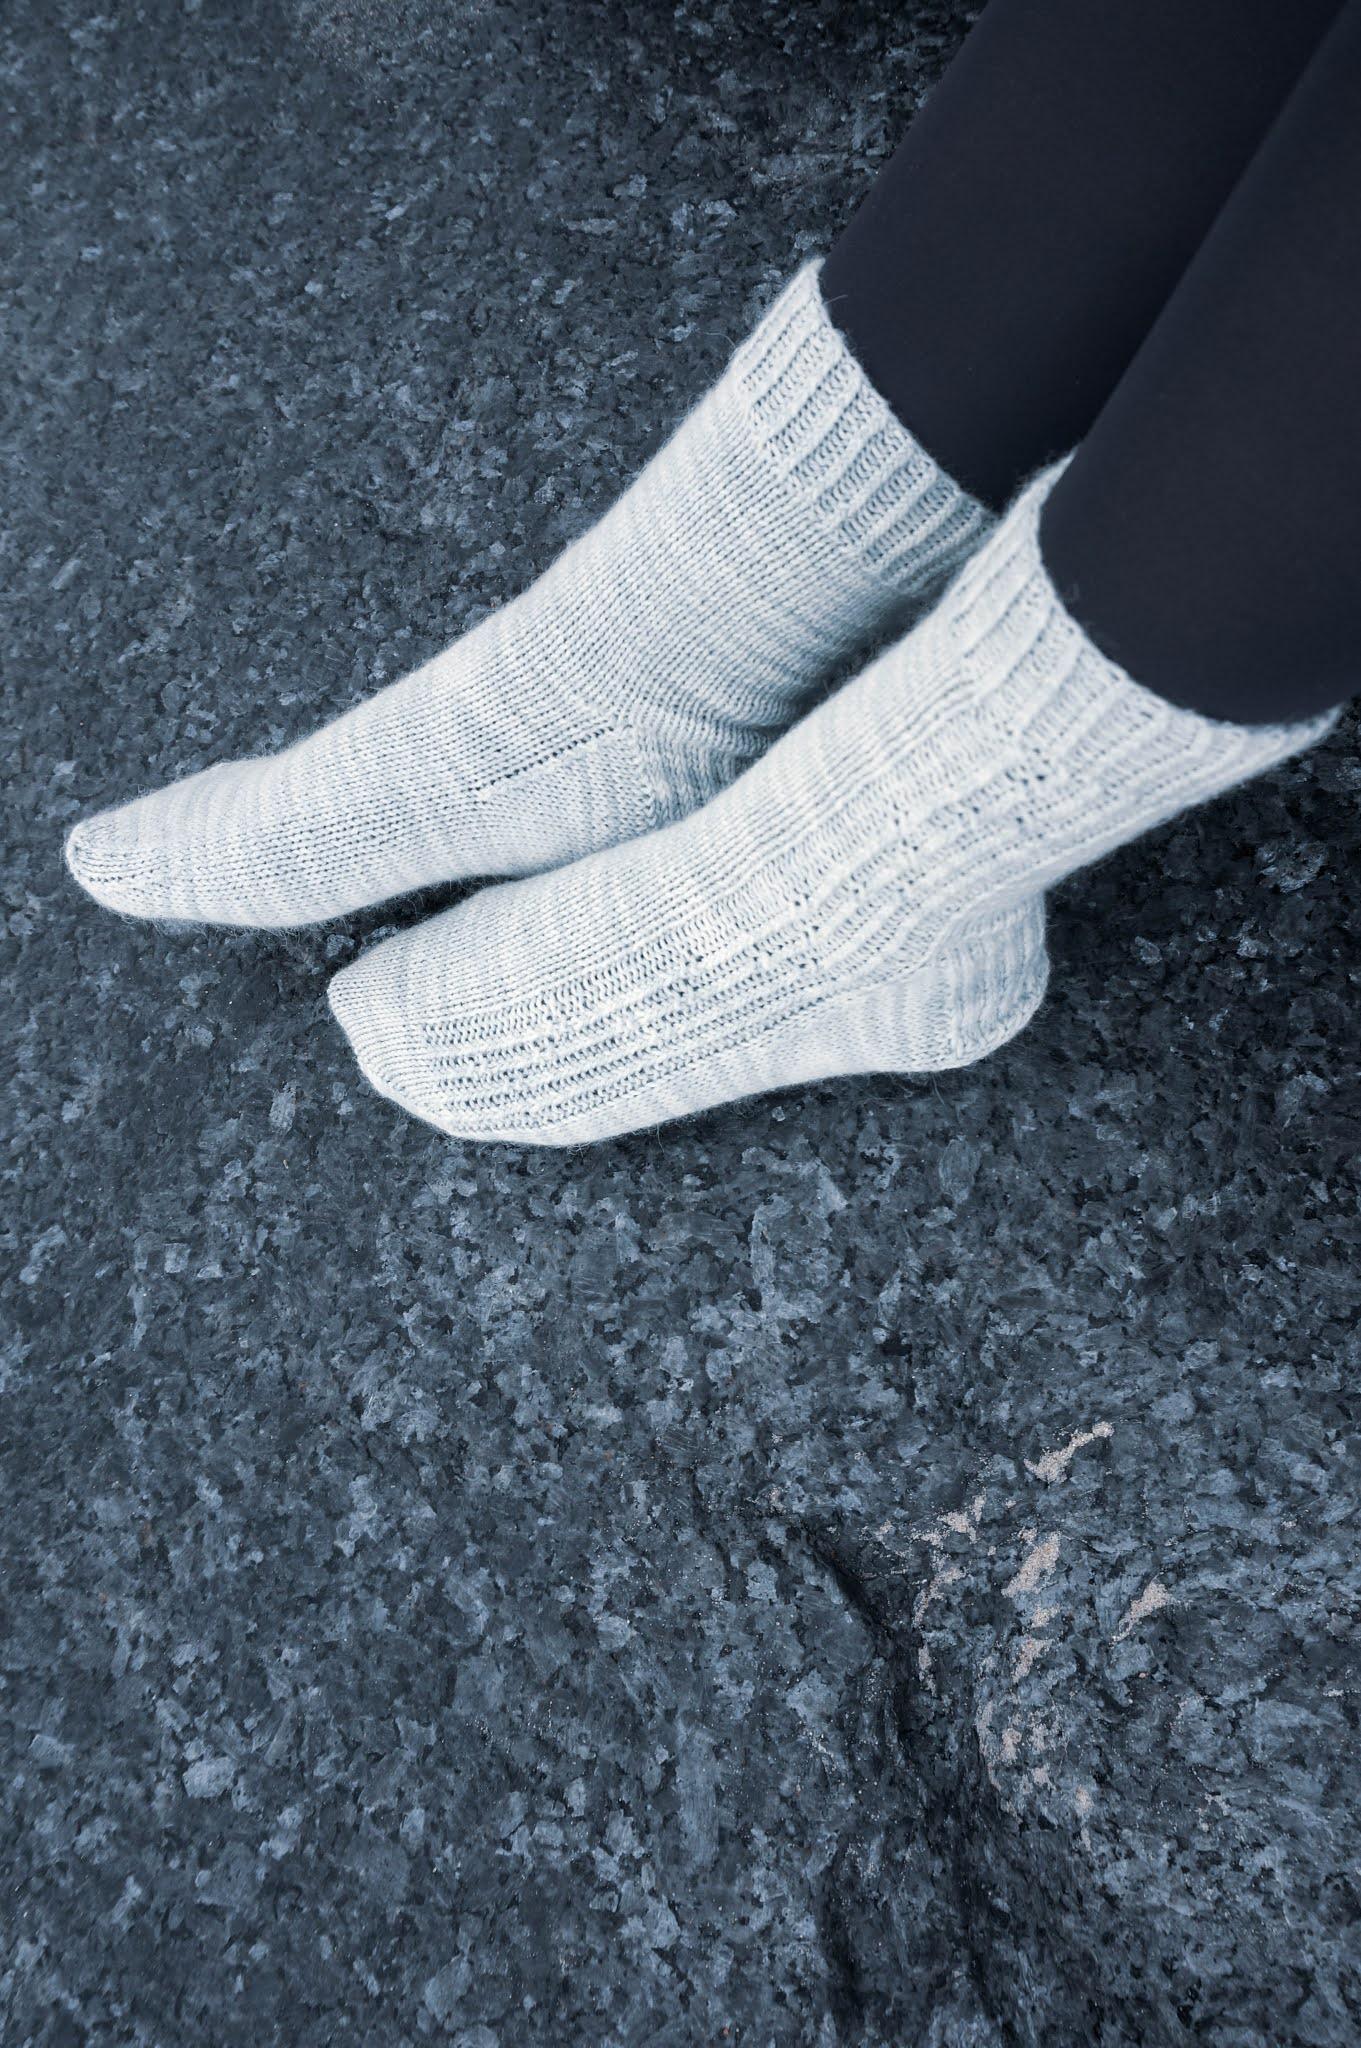 West Beach Knits Larvikite Socks knitting pattern